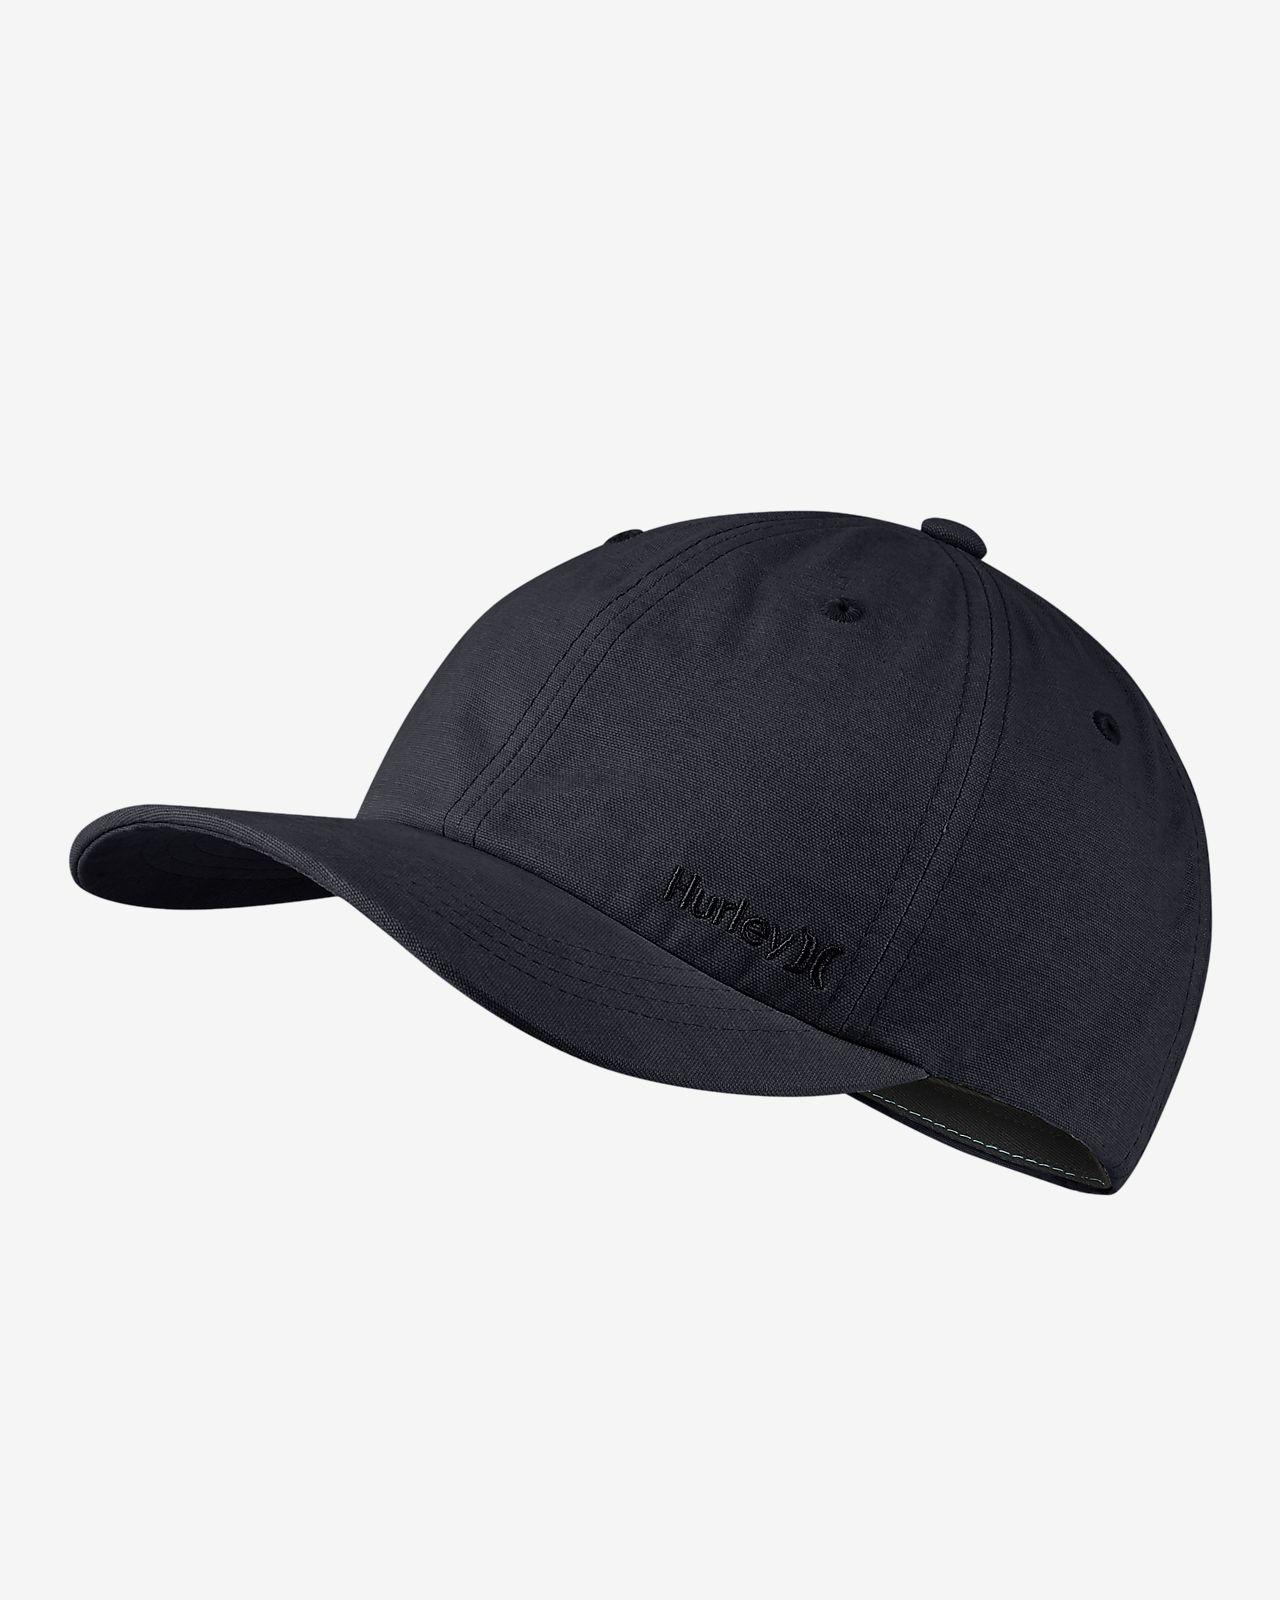 6b9e7666a1f23 Hurley Andy Men s Hat. Nike.com